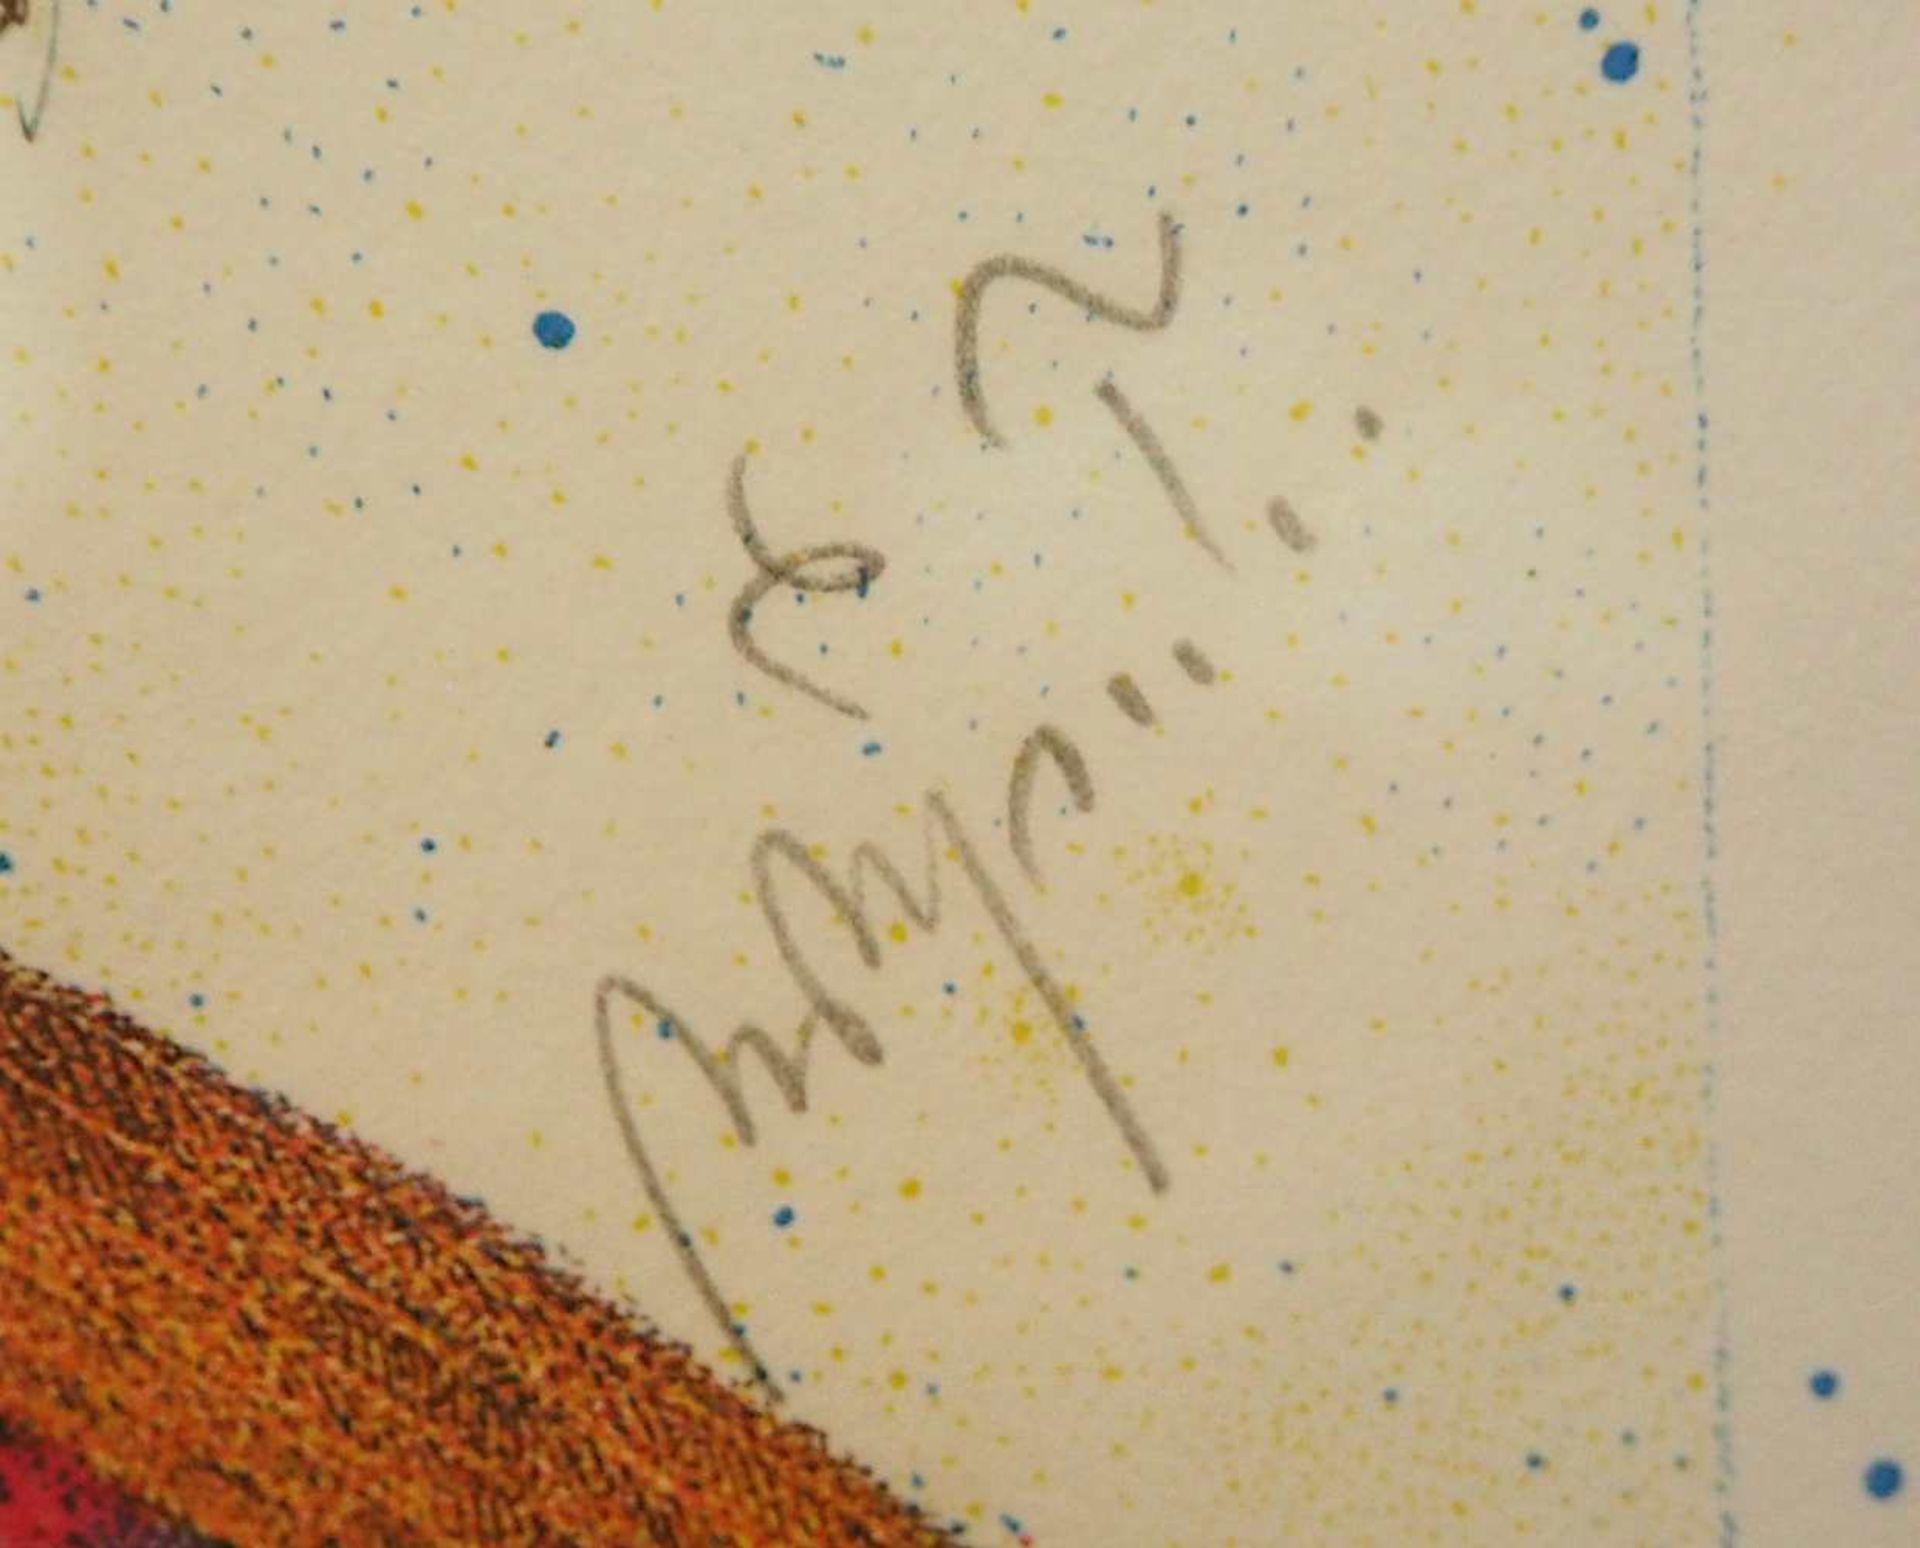 1 Farblithografie Mitte rechts bleistiftsign. M. M. PRECHTL (wohl Michael Mathias P. 1926-2003), - Bild 3 aus 4